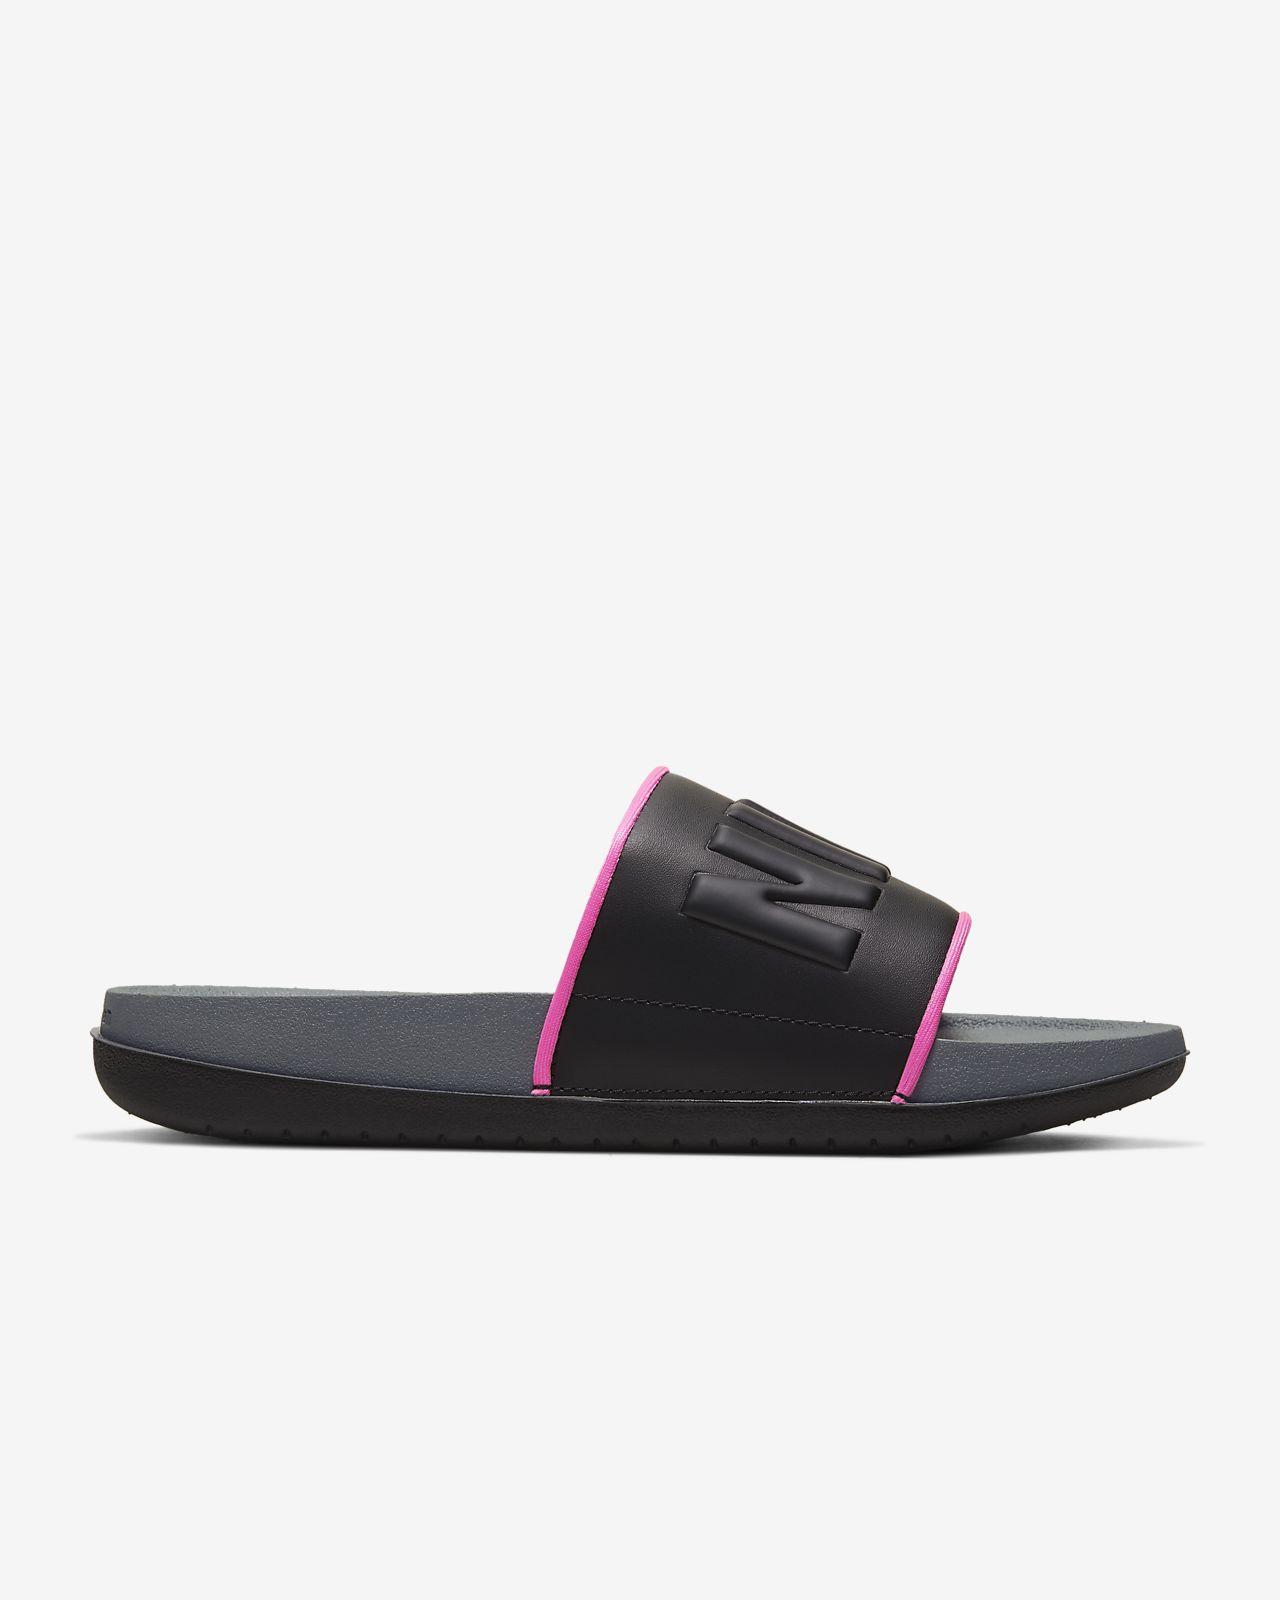 Women's Nike Benassi Duo Ultra Sandals Black Dark Grey